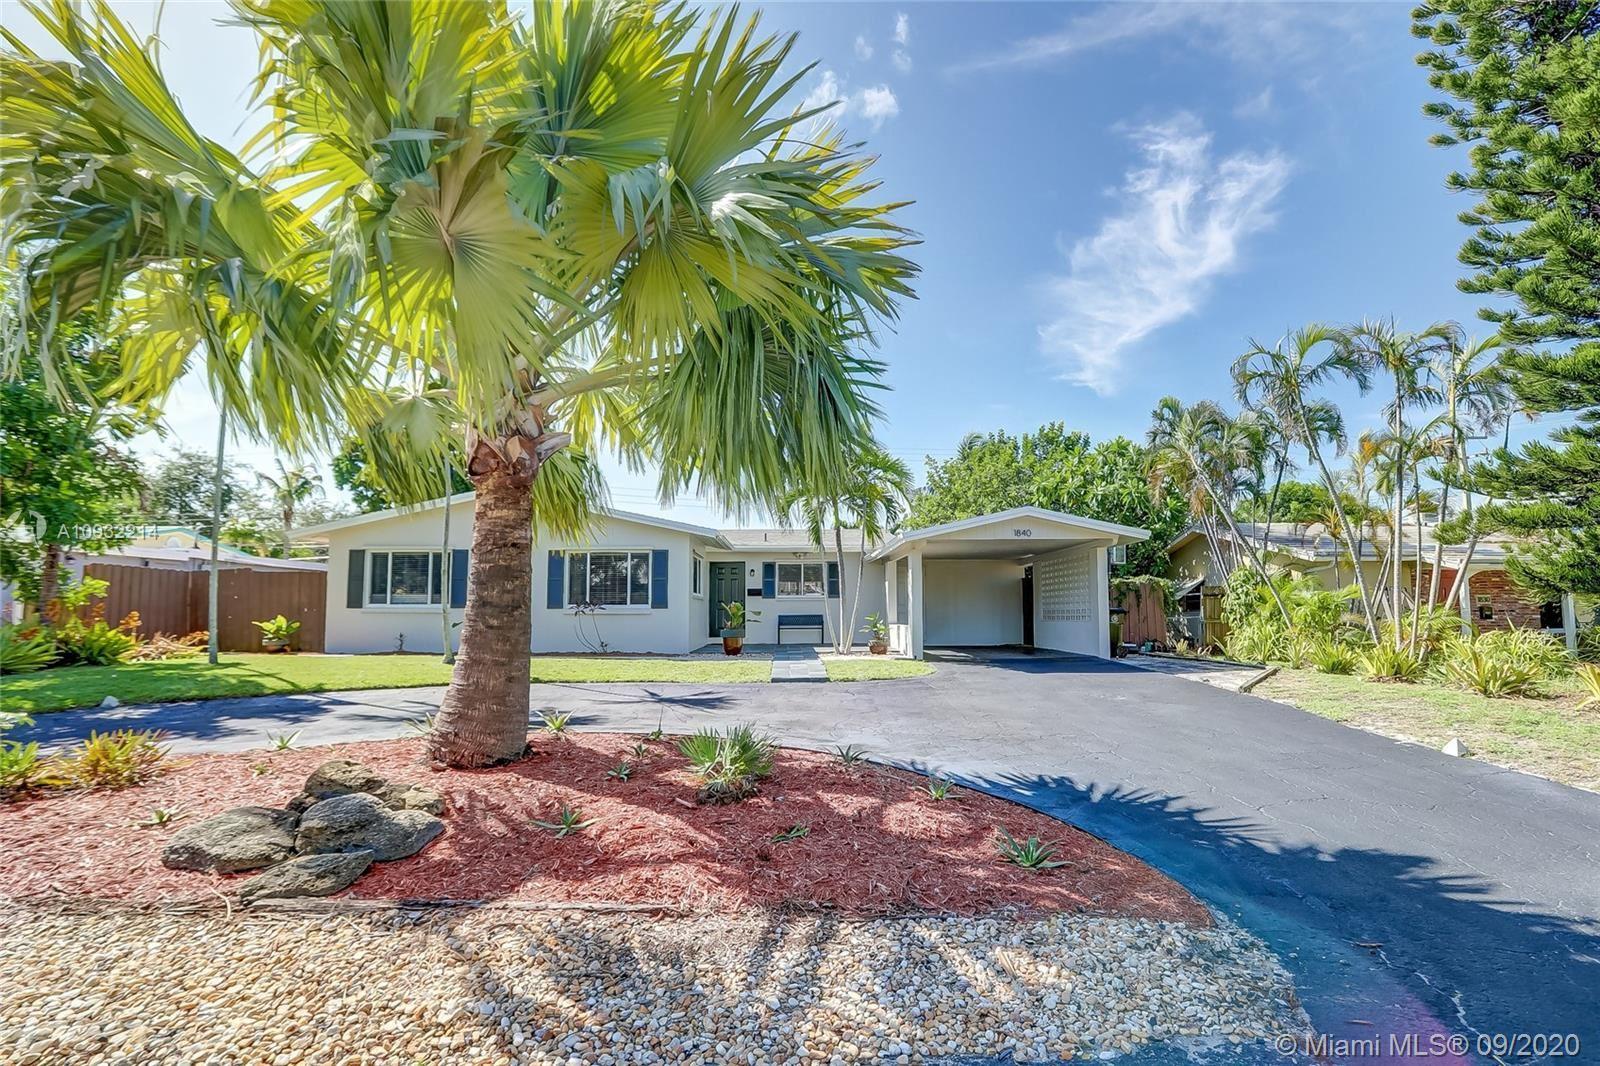 Photo of 1840 NE 47th St, Fort Lauderdale, FL 33308 (MLS # A10932214)